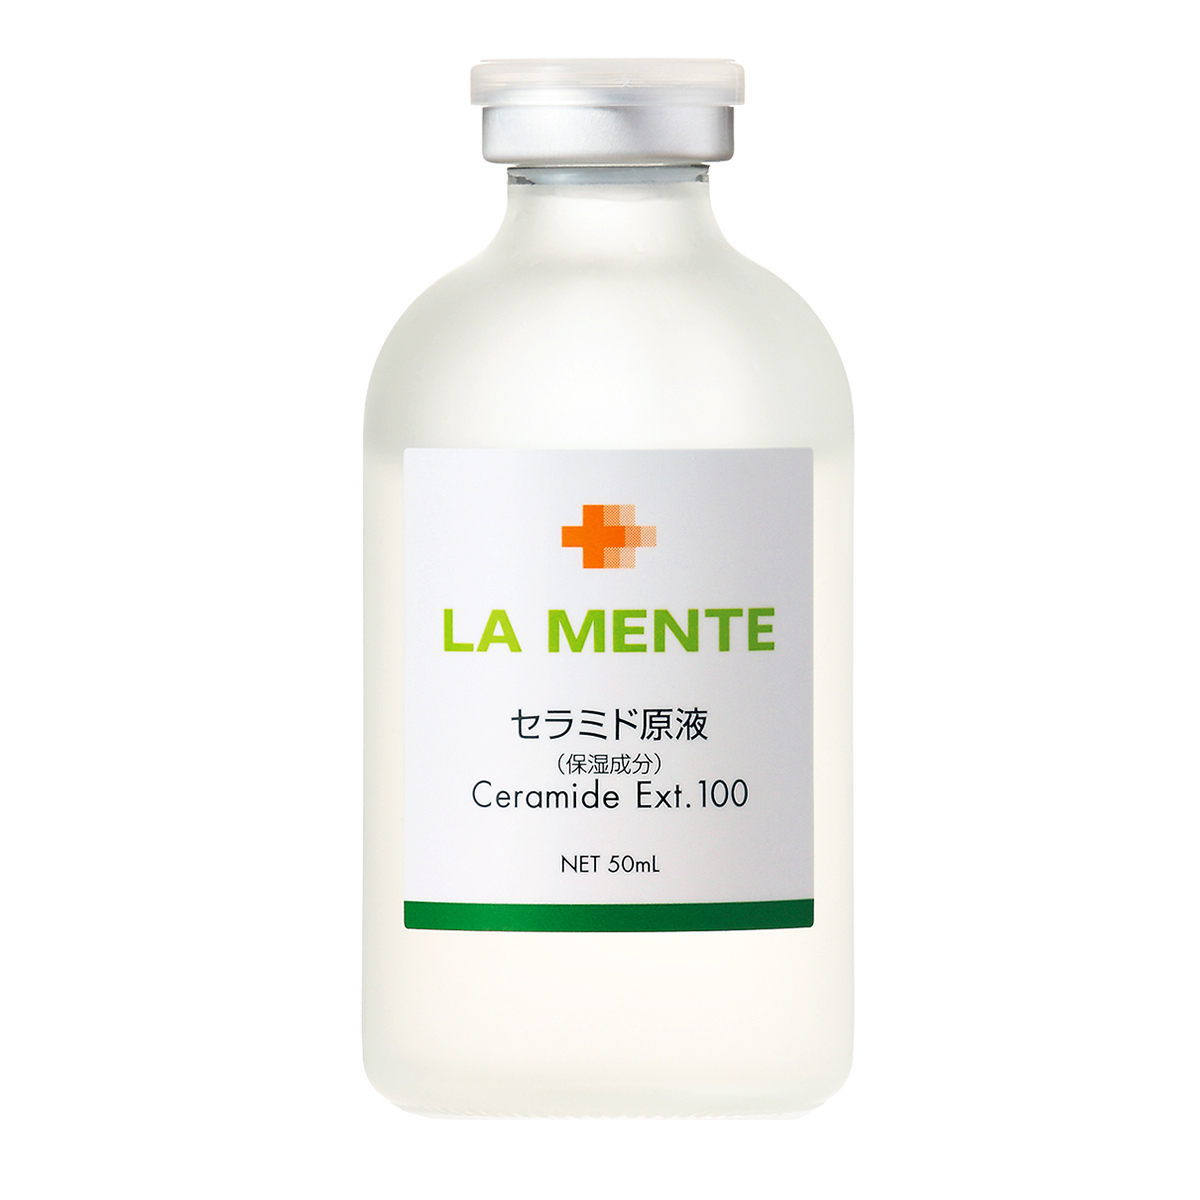 【LA MENTE】ラメンテ ピュアセラミド100+ 50mL